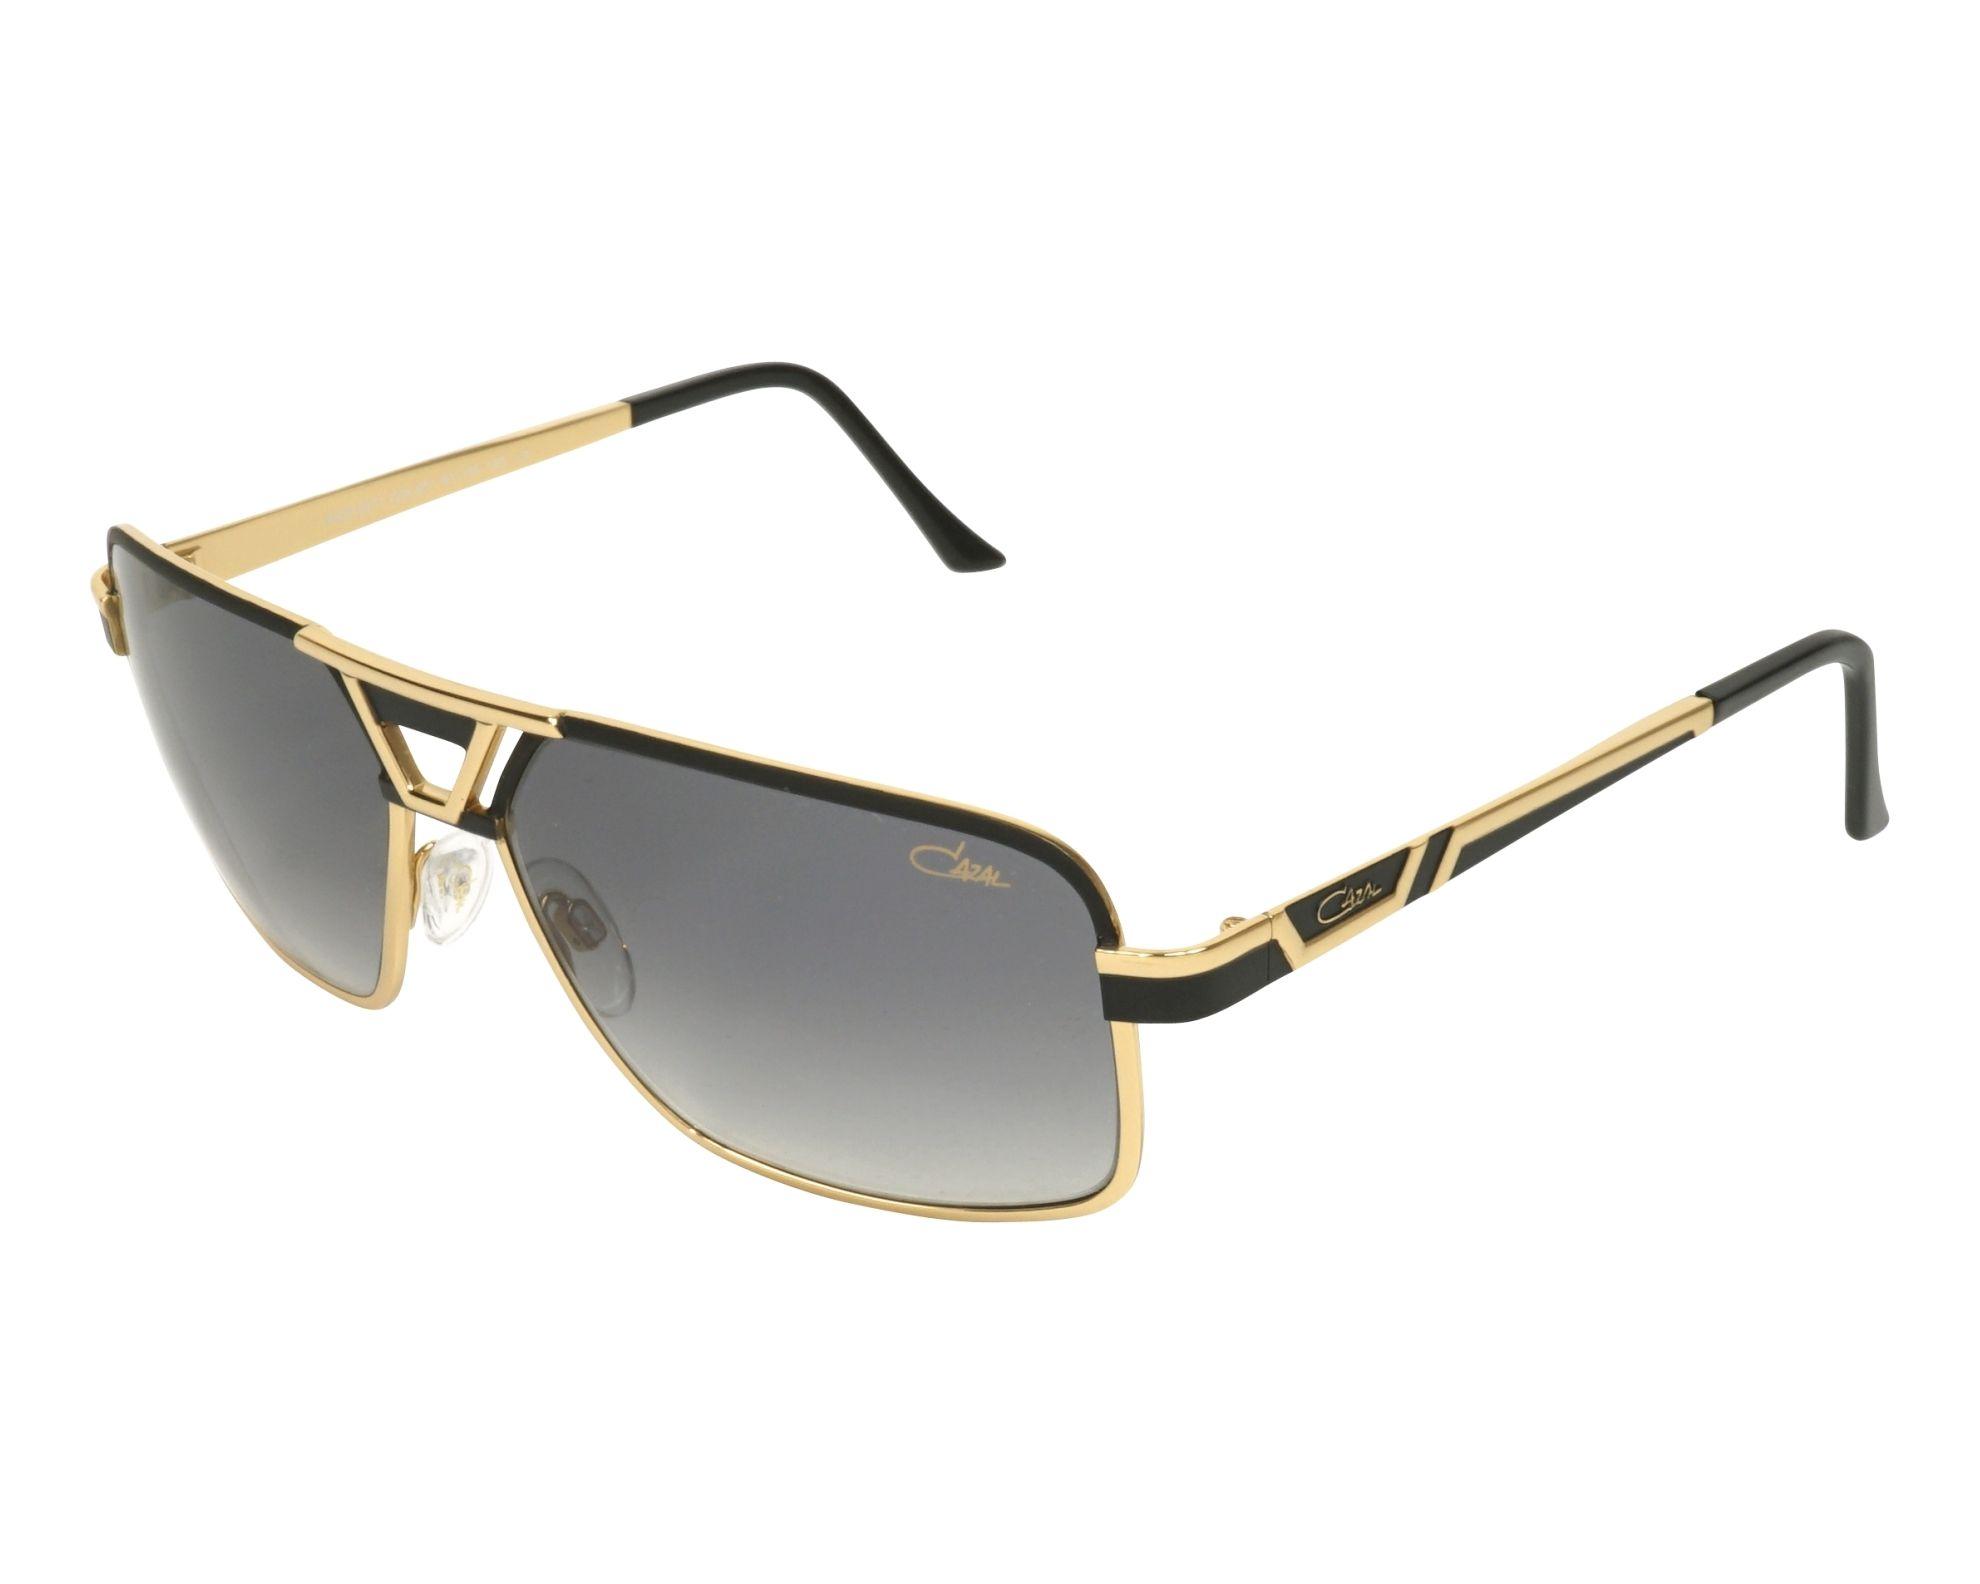 9cba002cbb1 Sunglasses Cazal 9071 001 61-15 Black Gold profile view